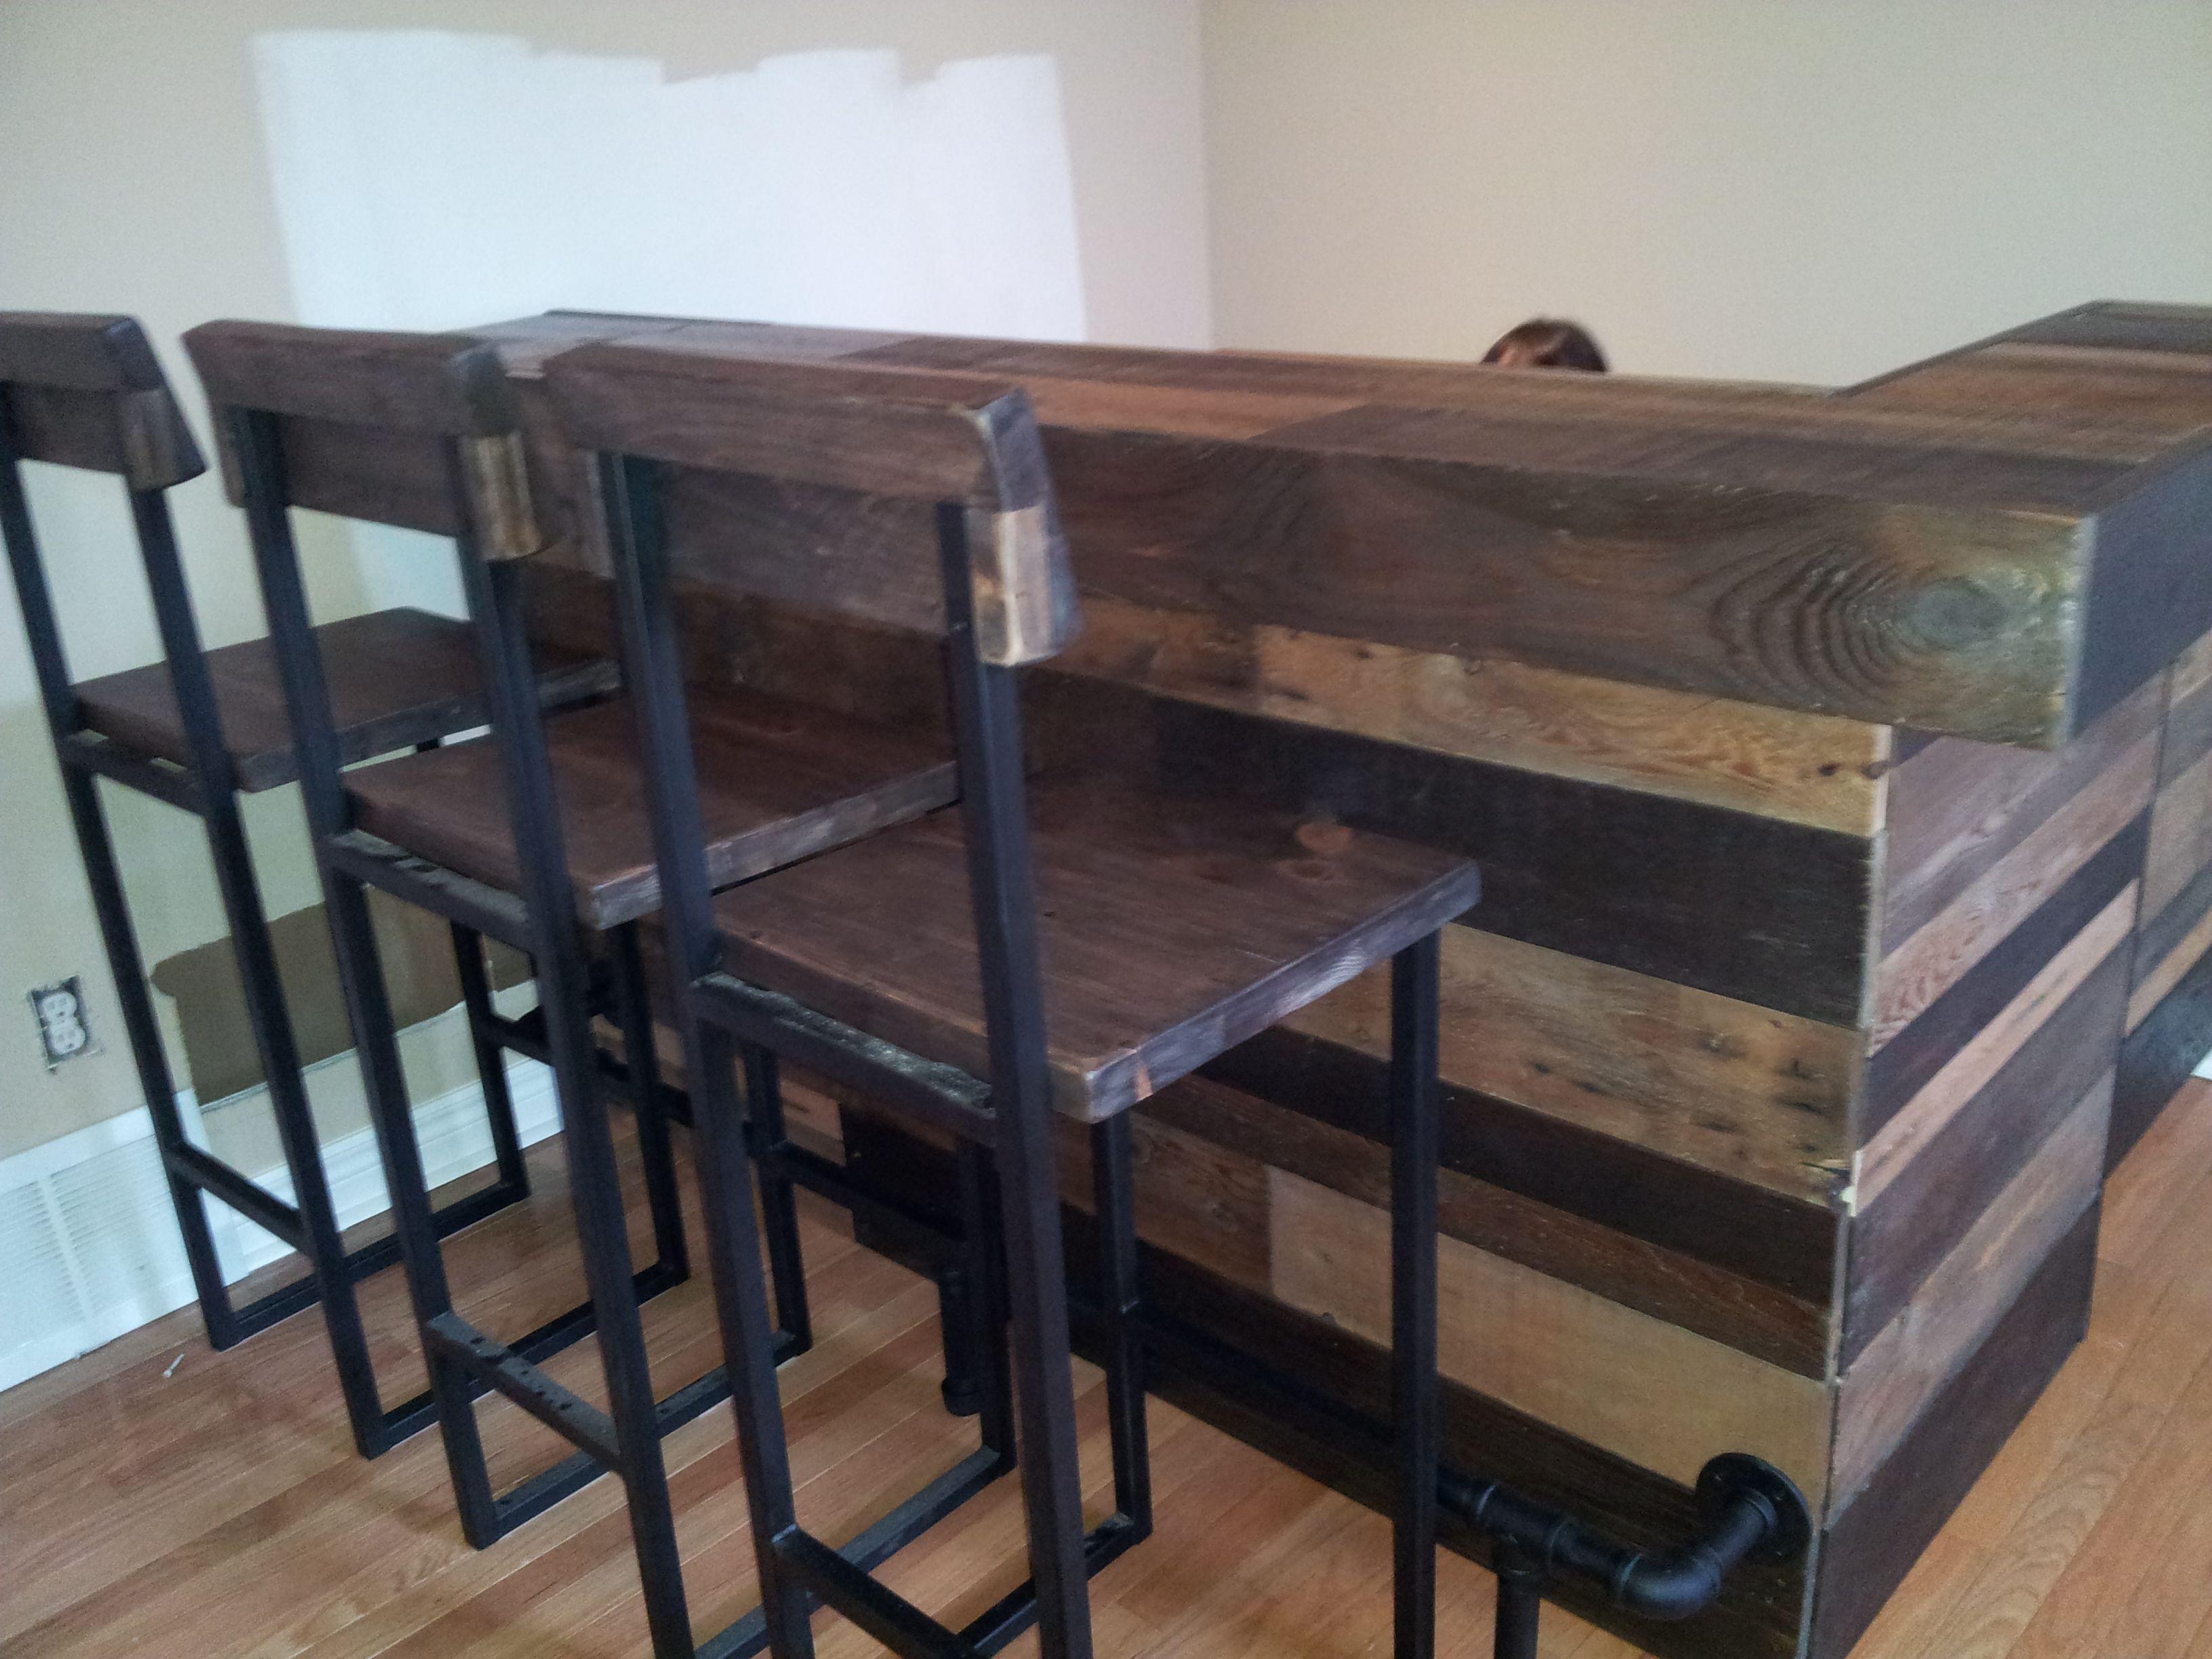 Upclaimed wood pallet bar basement bar for Pallet wood bar